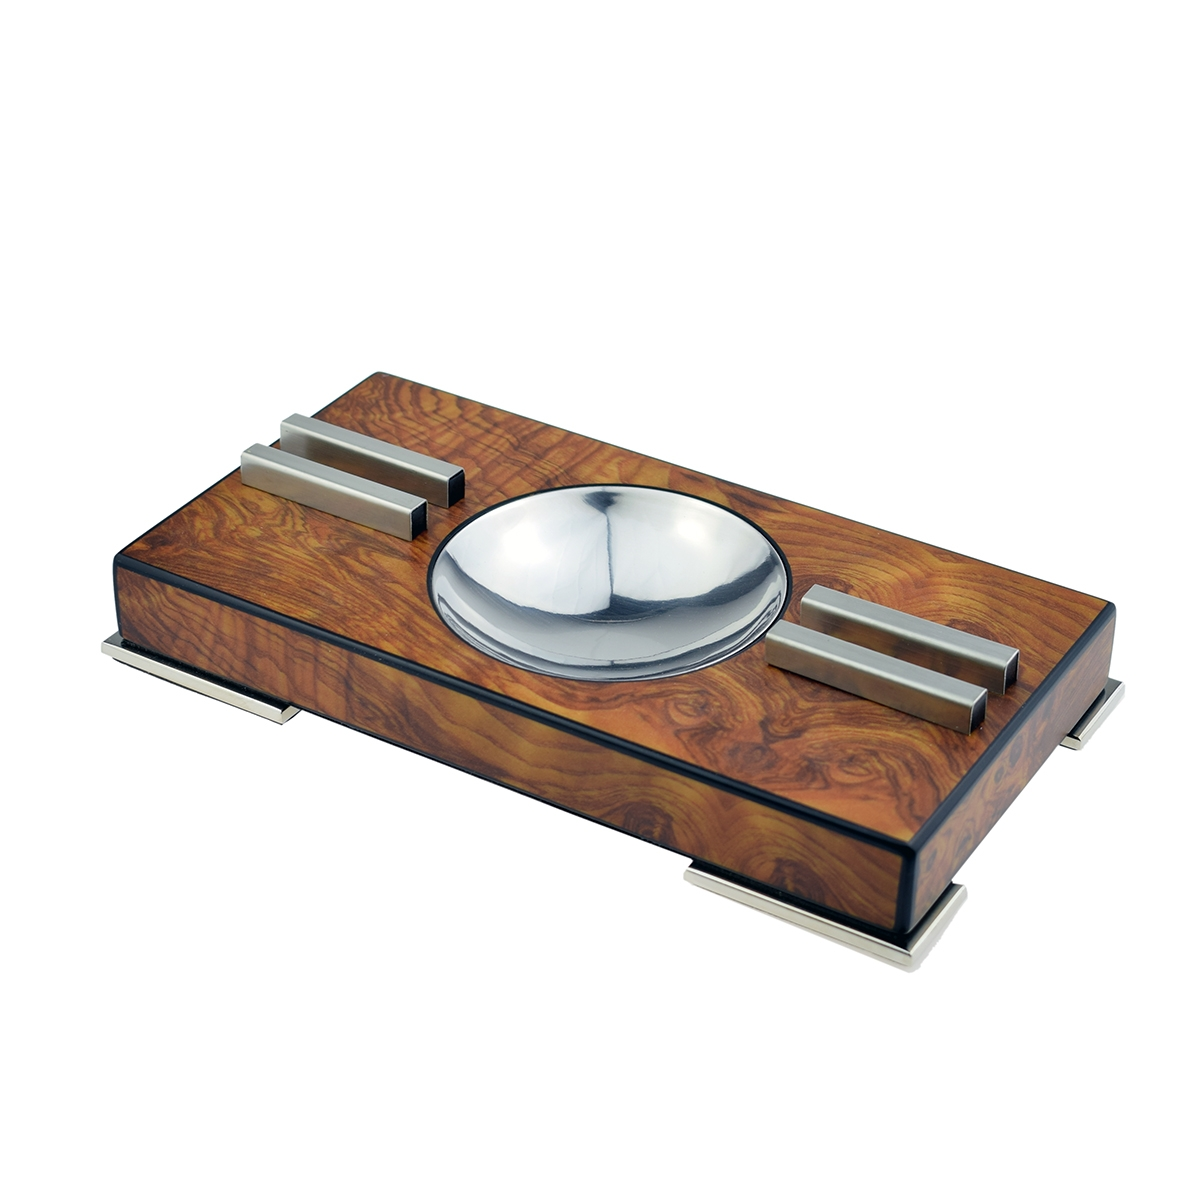 Elm Burl Polished Cigar Ashtray With Chrome Feet Boxed 1